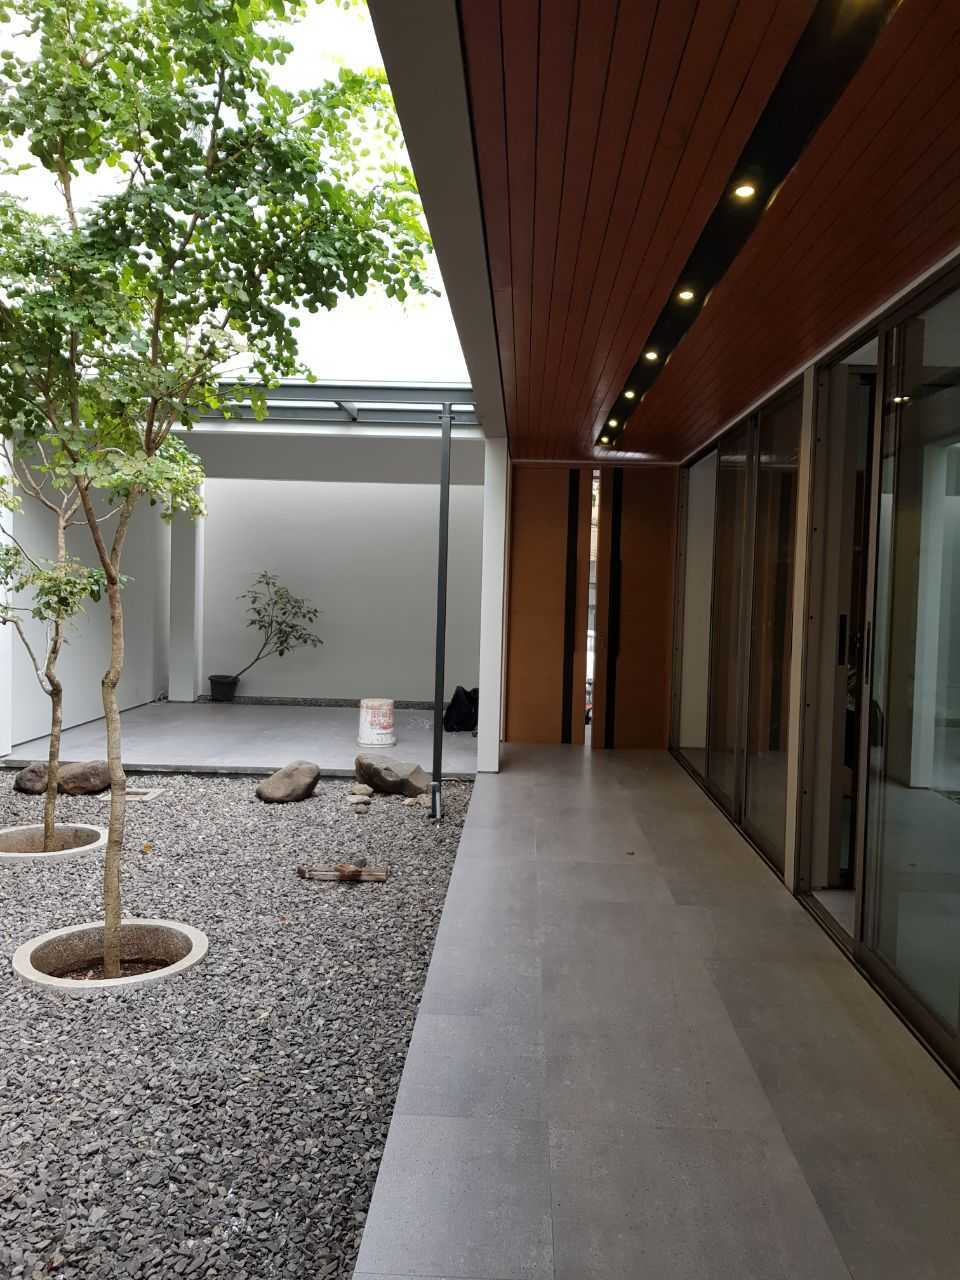 Arkides Bin House Bandung, Kota Bandung, Jawa Barat, Indonesia Bandung, Kota Bandung, Jawa Barat, Indonesia Arkides-Bin-House  61304